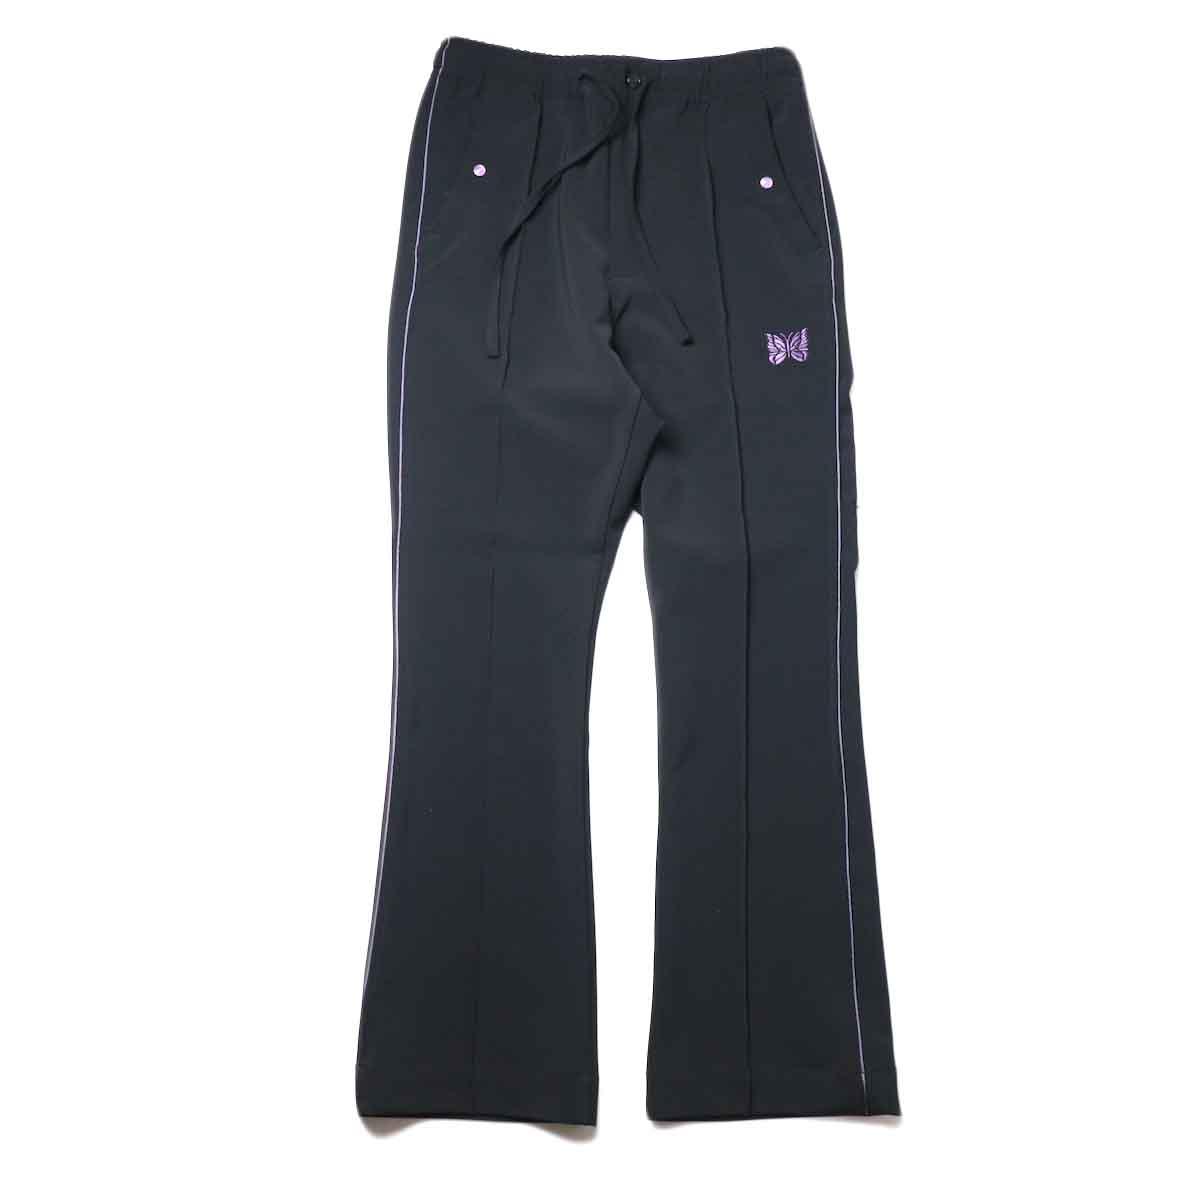 Needles / PIPING COWBOY PANT - PE/PU DOUBLE CLOTH (Black)